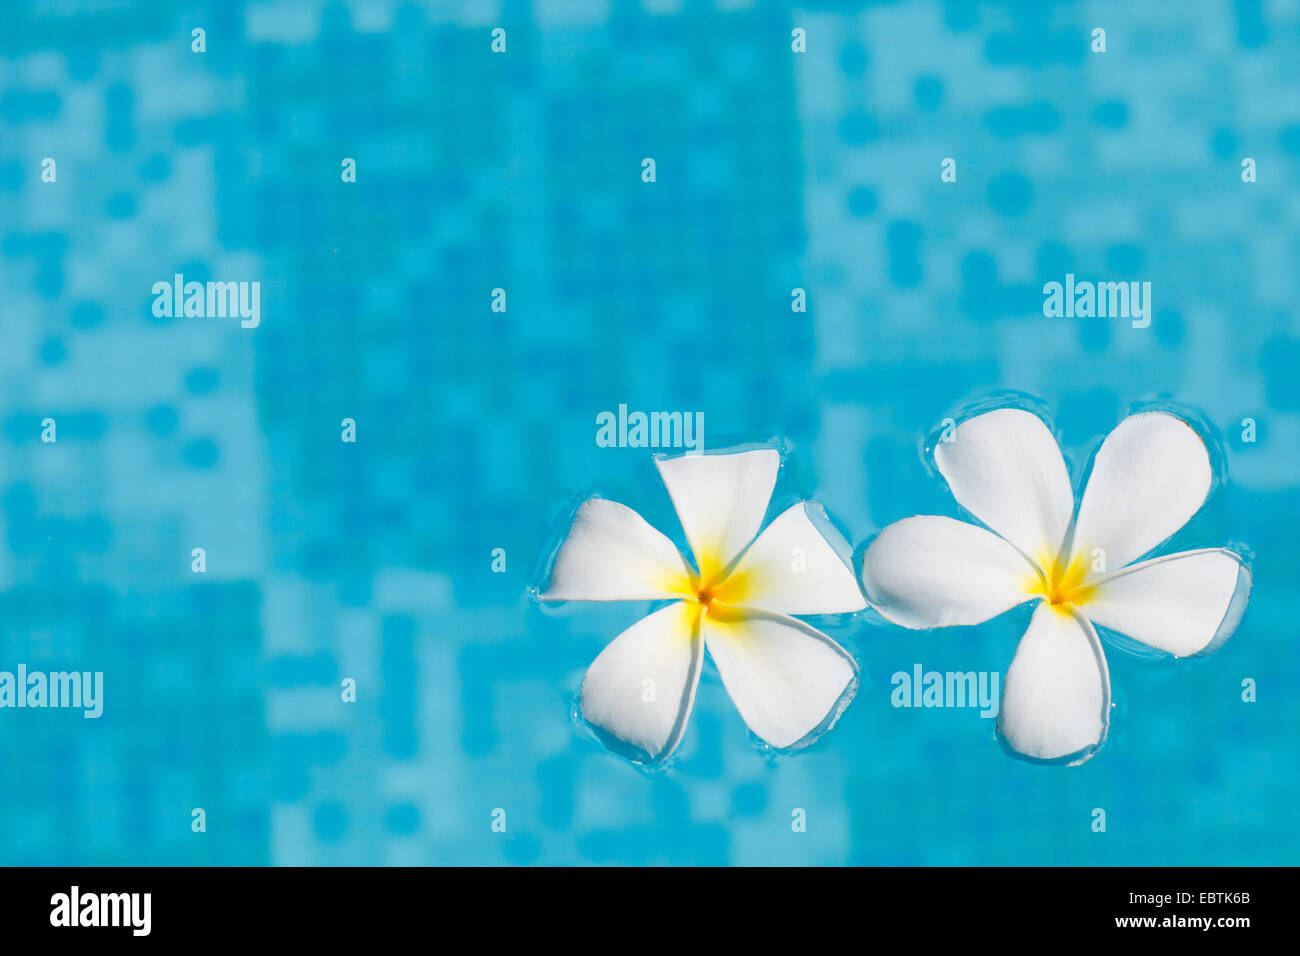 Two frangipani flowers in blue water stock photo royalty free image two frangipani flowers in blue water izmirmasajfo